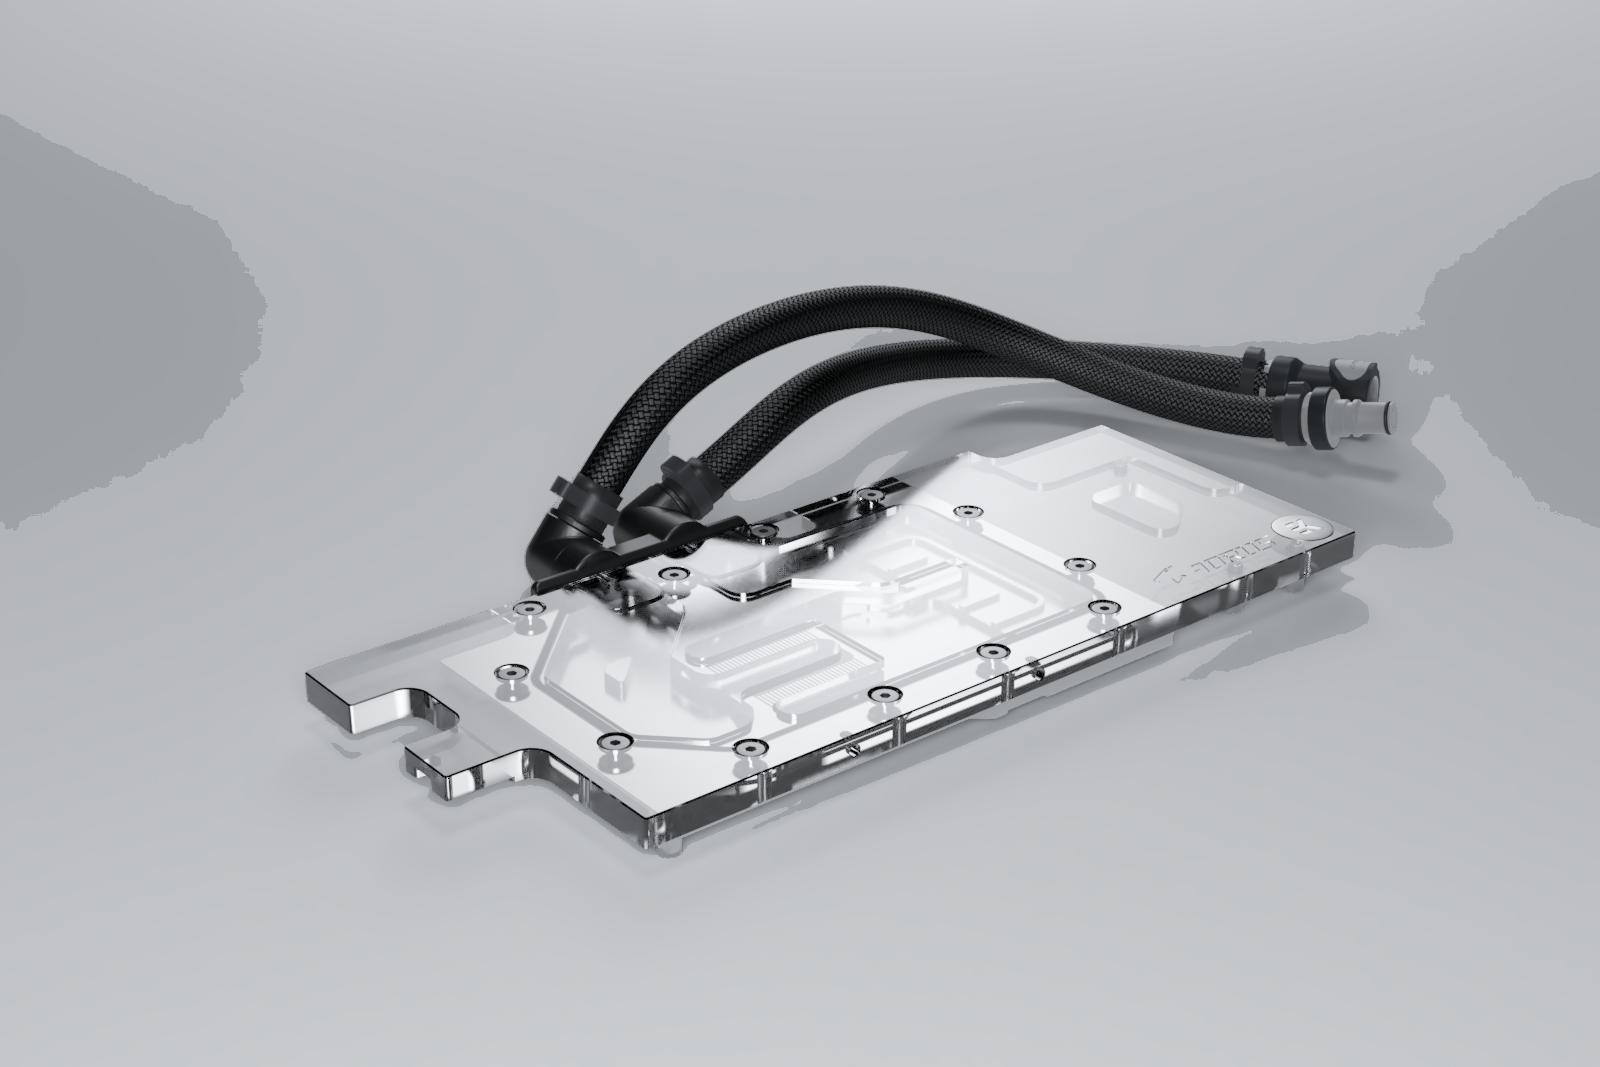 EK-MLC GPU Core FC1080 GTX Ti Aorus - Nickel (rev. 2.0)